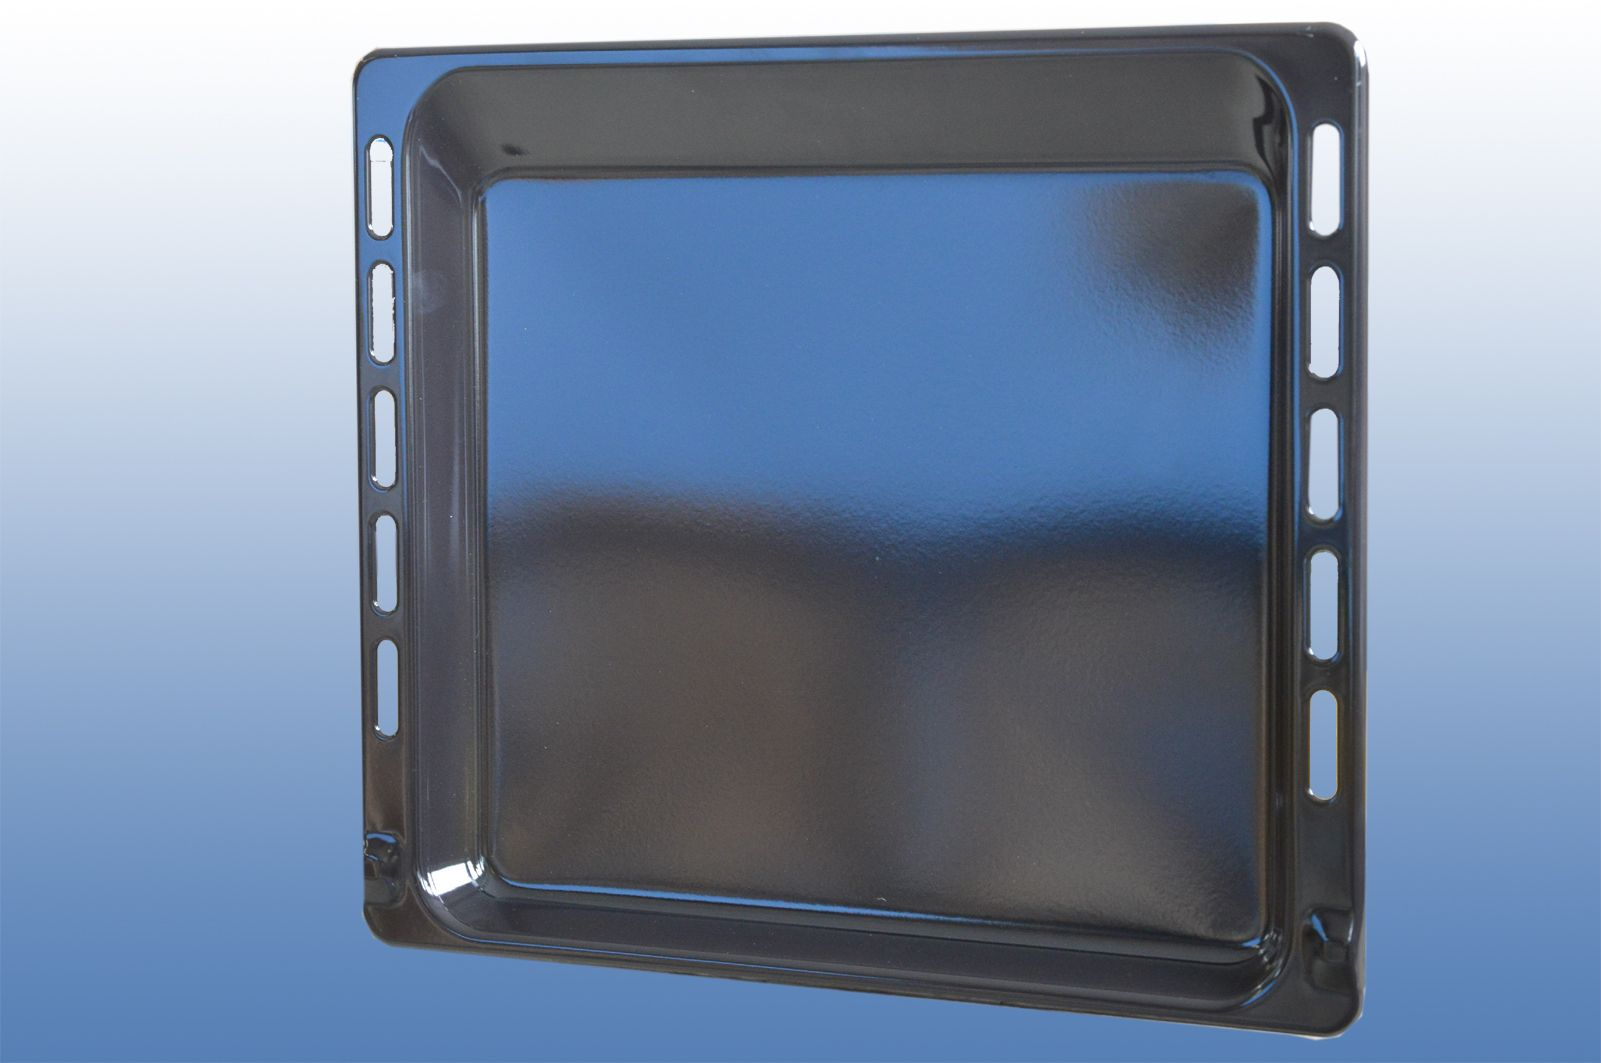 fettpfanne bauknecht whirlpool ikea ignis emailliert original neu. Black Bedroom Furniture Sets. Home Design Ideas